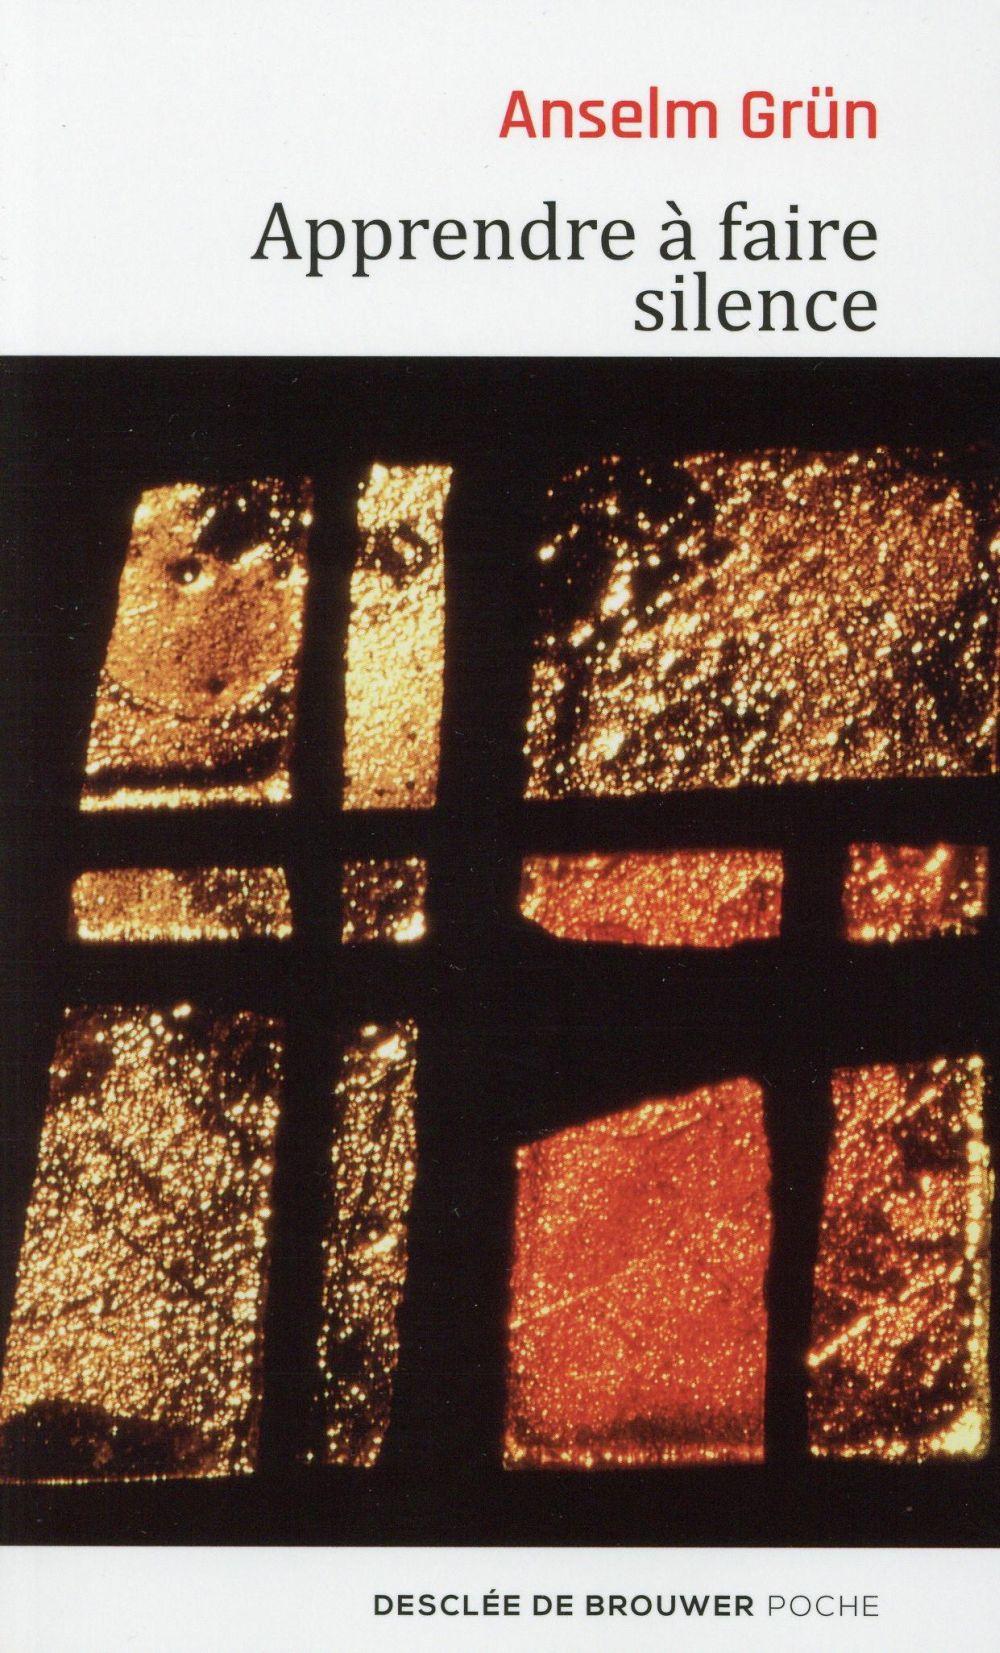 APPRENDRE A FAIRE SILENCE